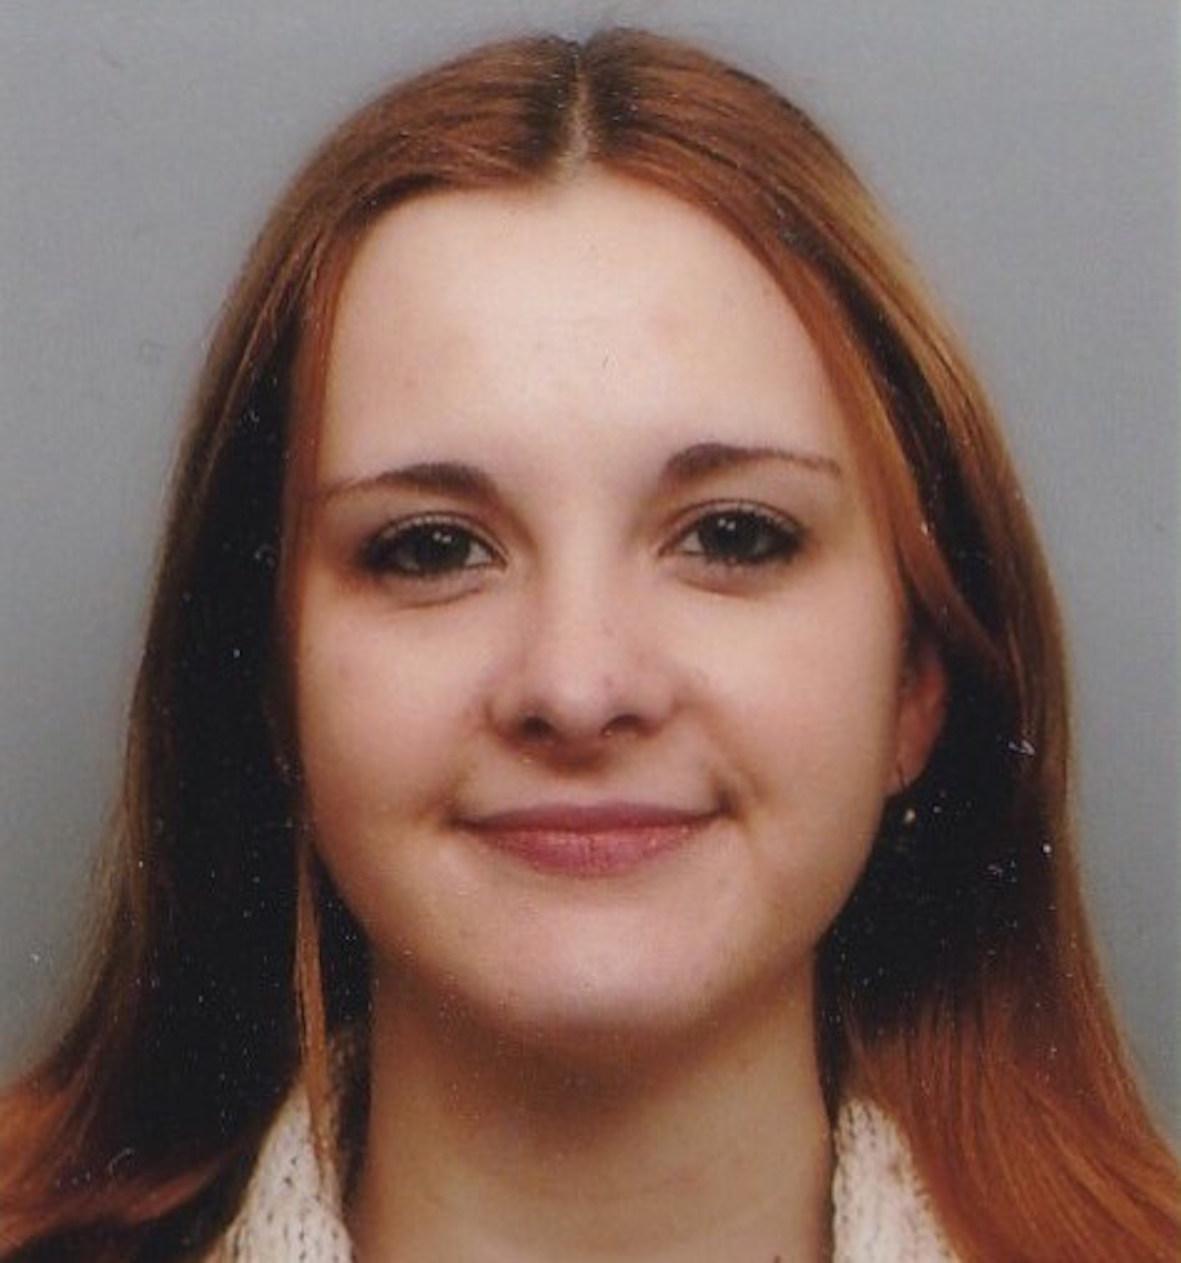 Natalie Niessen